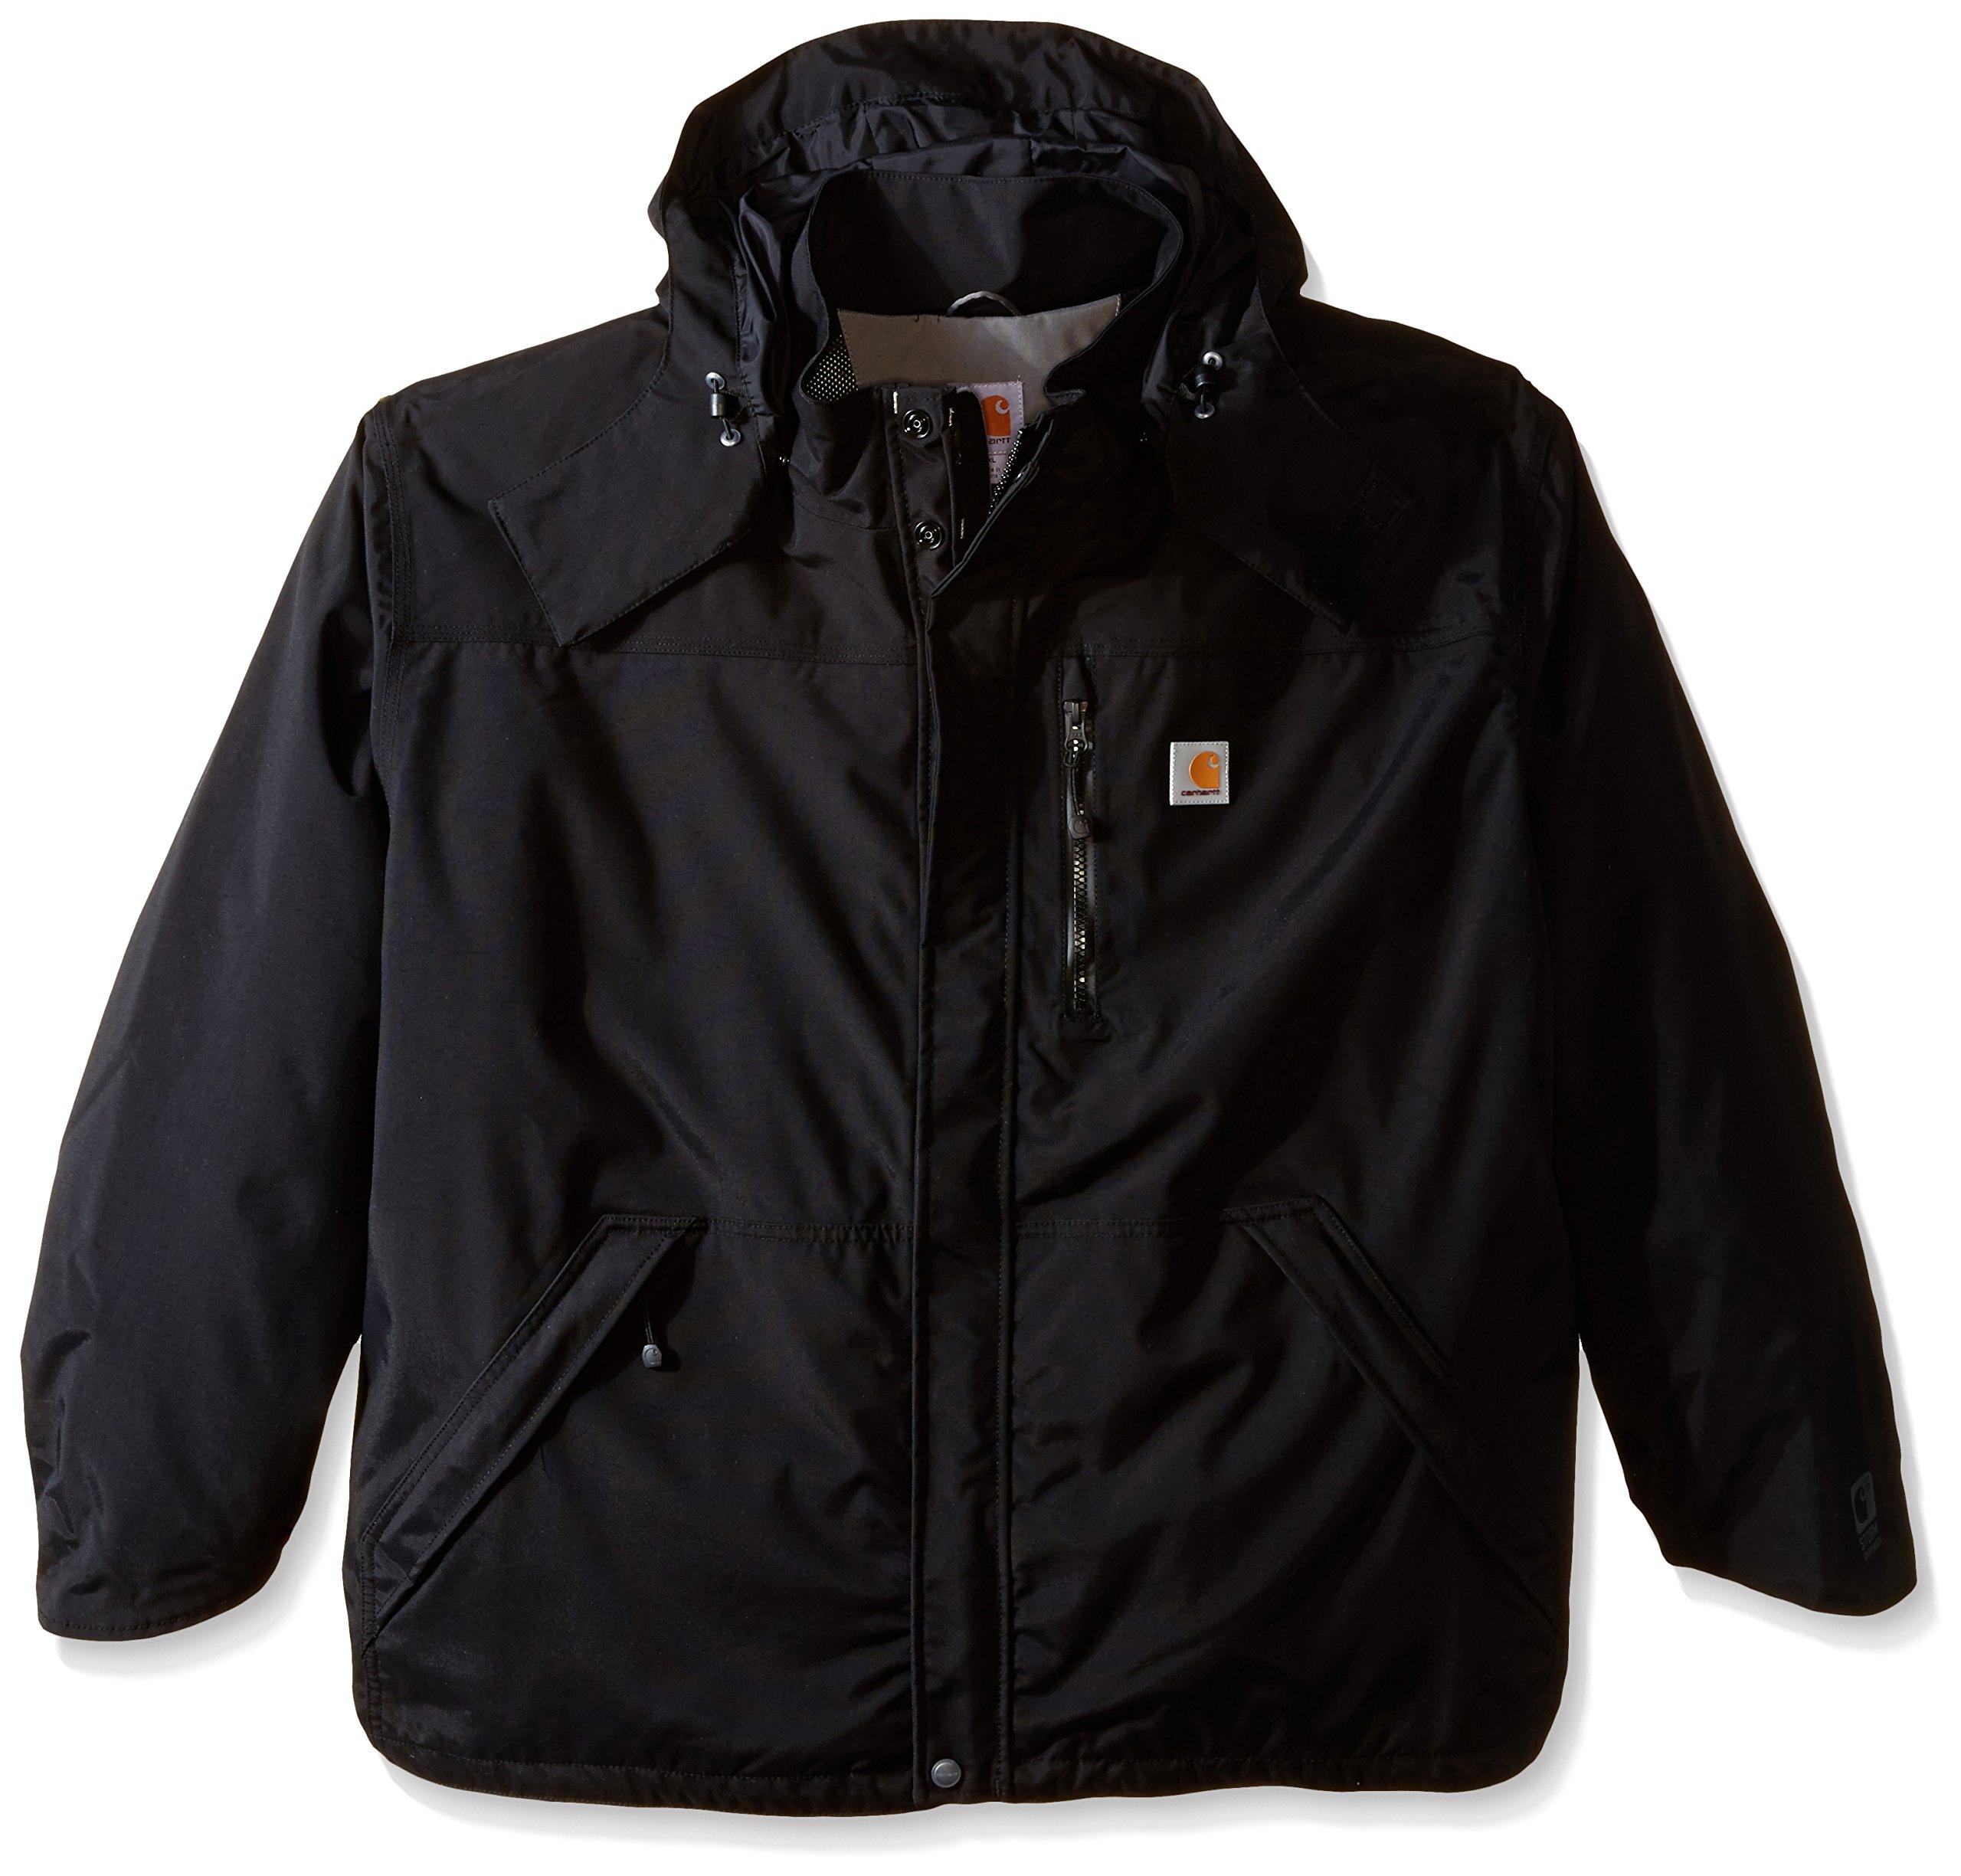 Carhartt Men's Big & Tall Shoreline Jacket Waterproof Breathable Nylon,Black,XXX-Large Tall